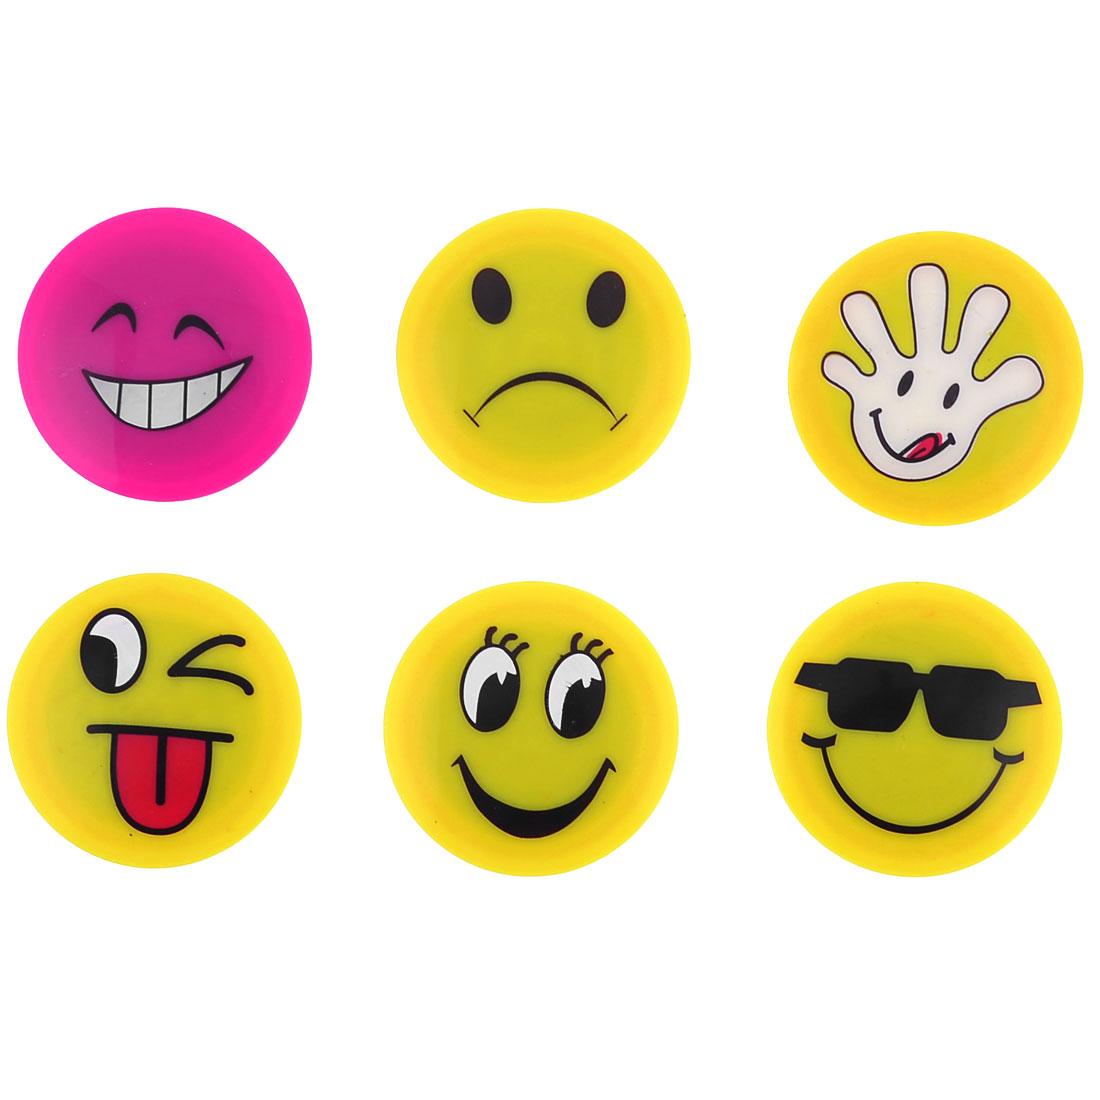 Cartoon Face Plastic File Cabinet Refrigerator Magnet Sticker 6PCS